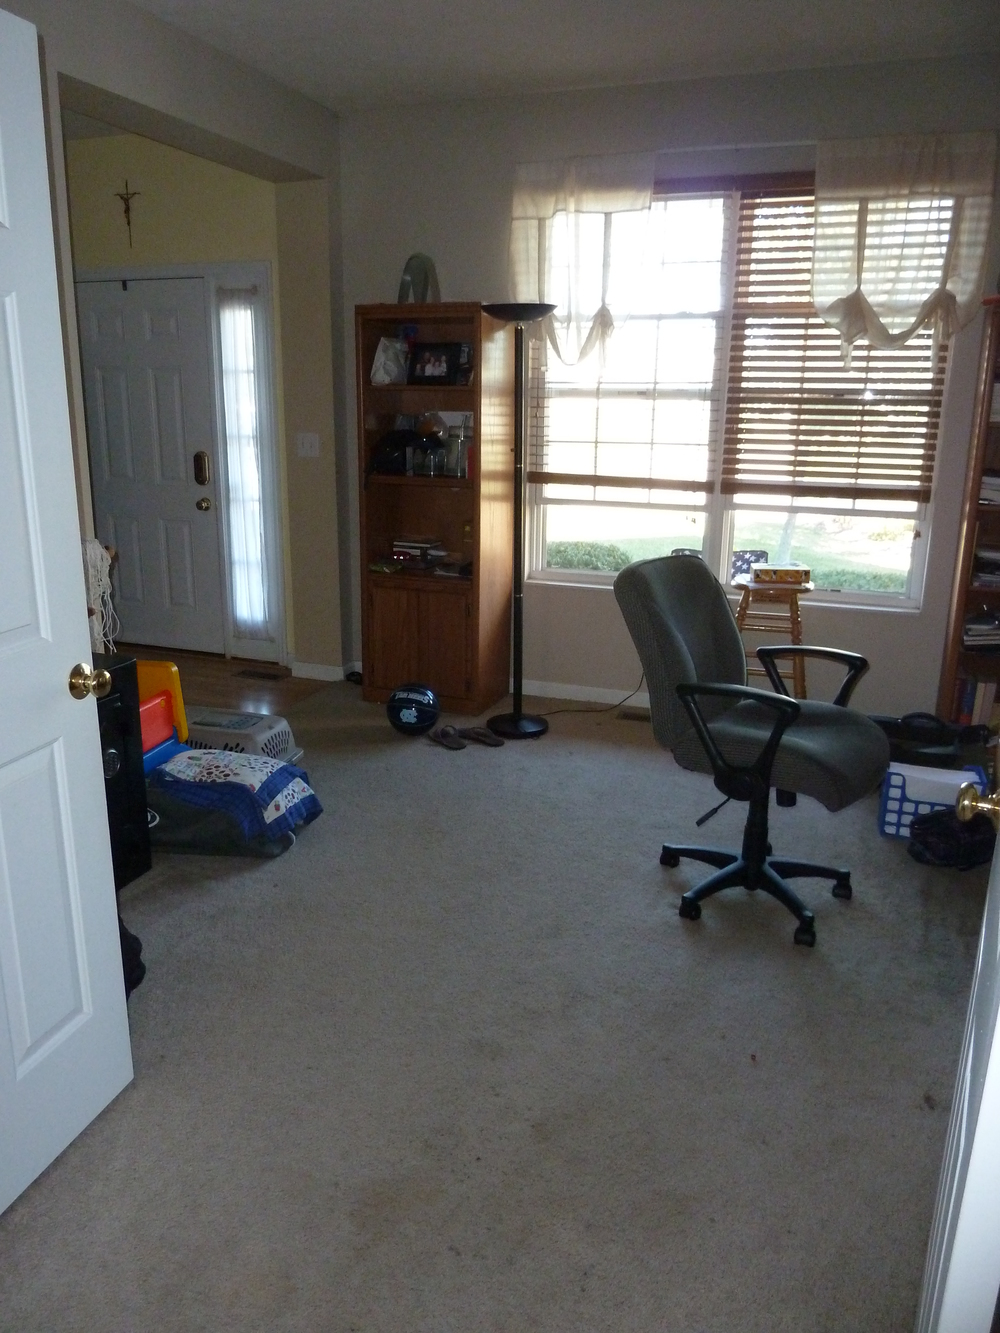 Living room before laminate floors